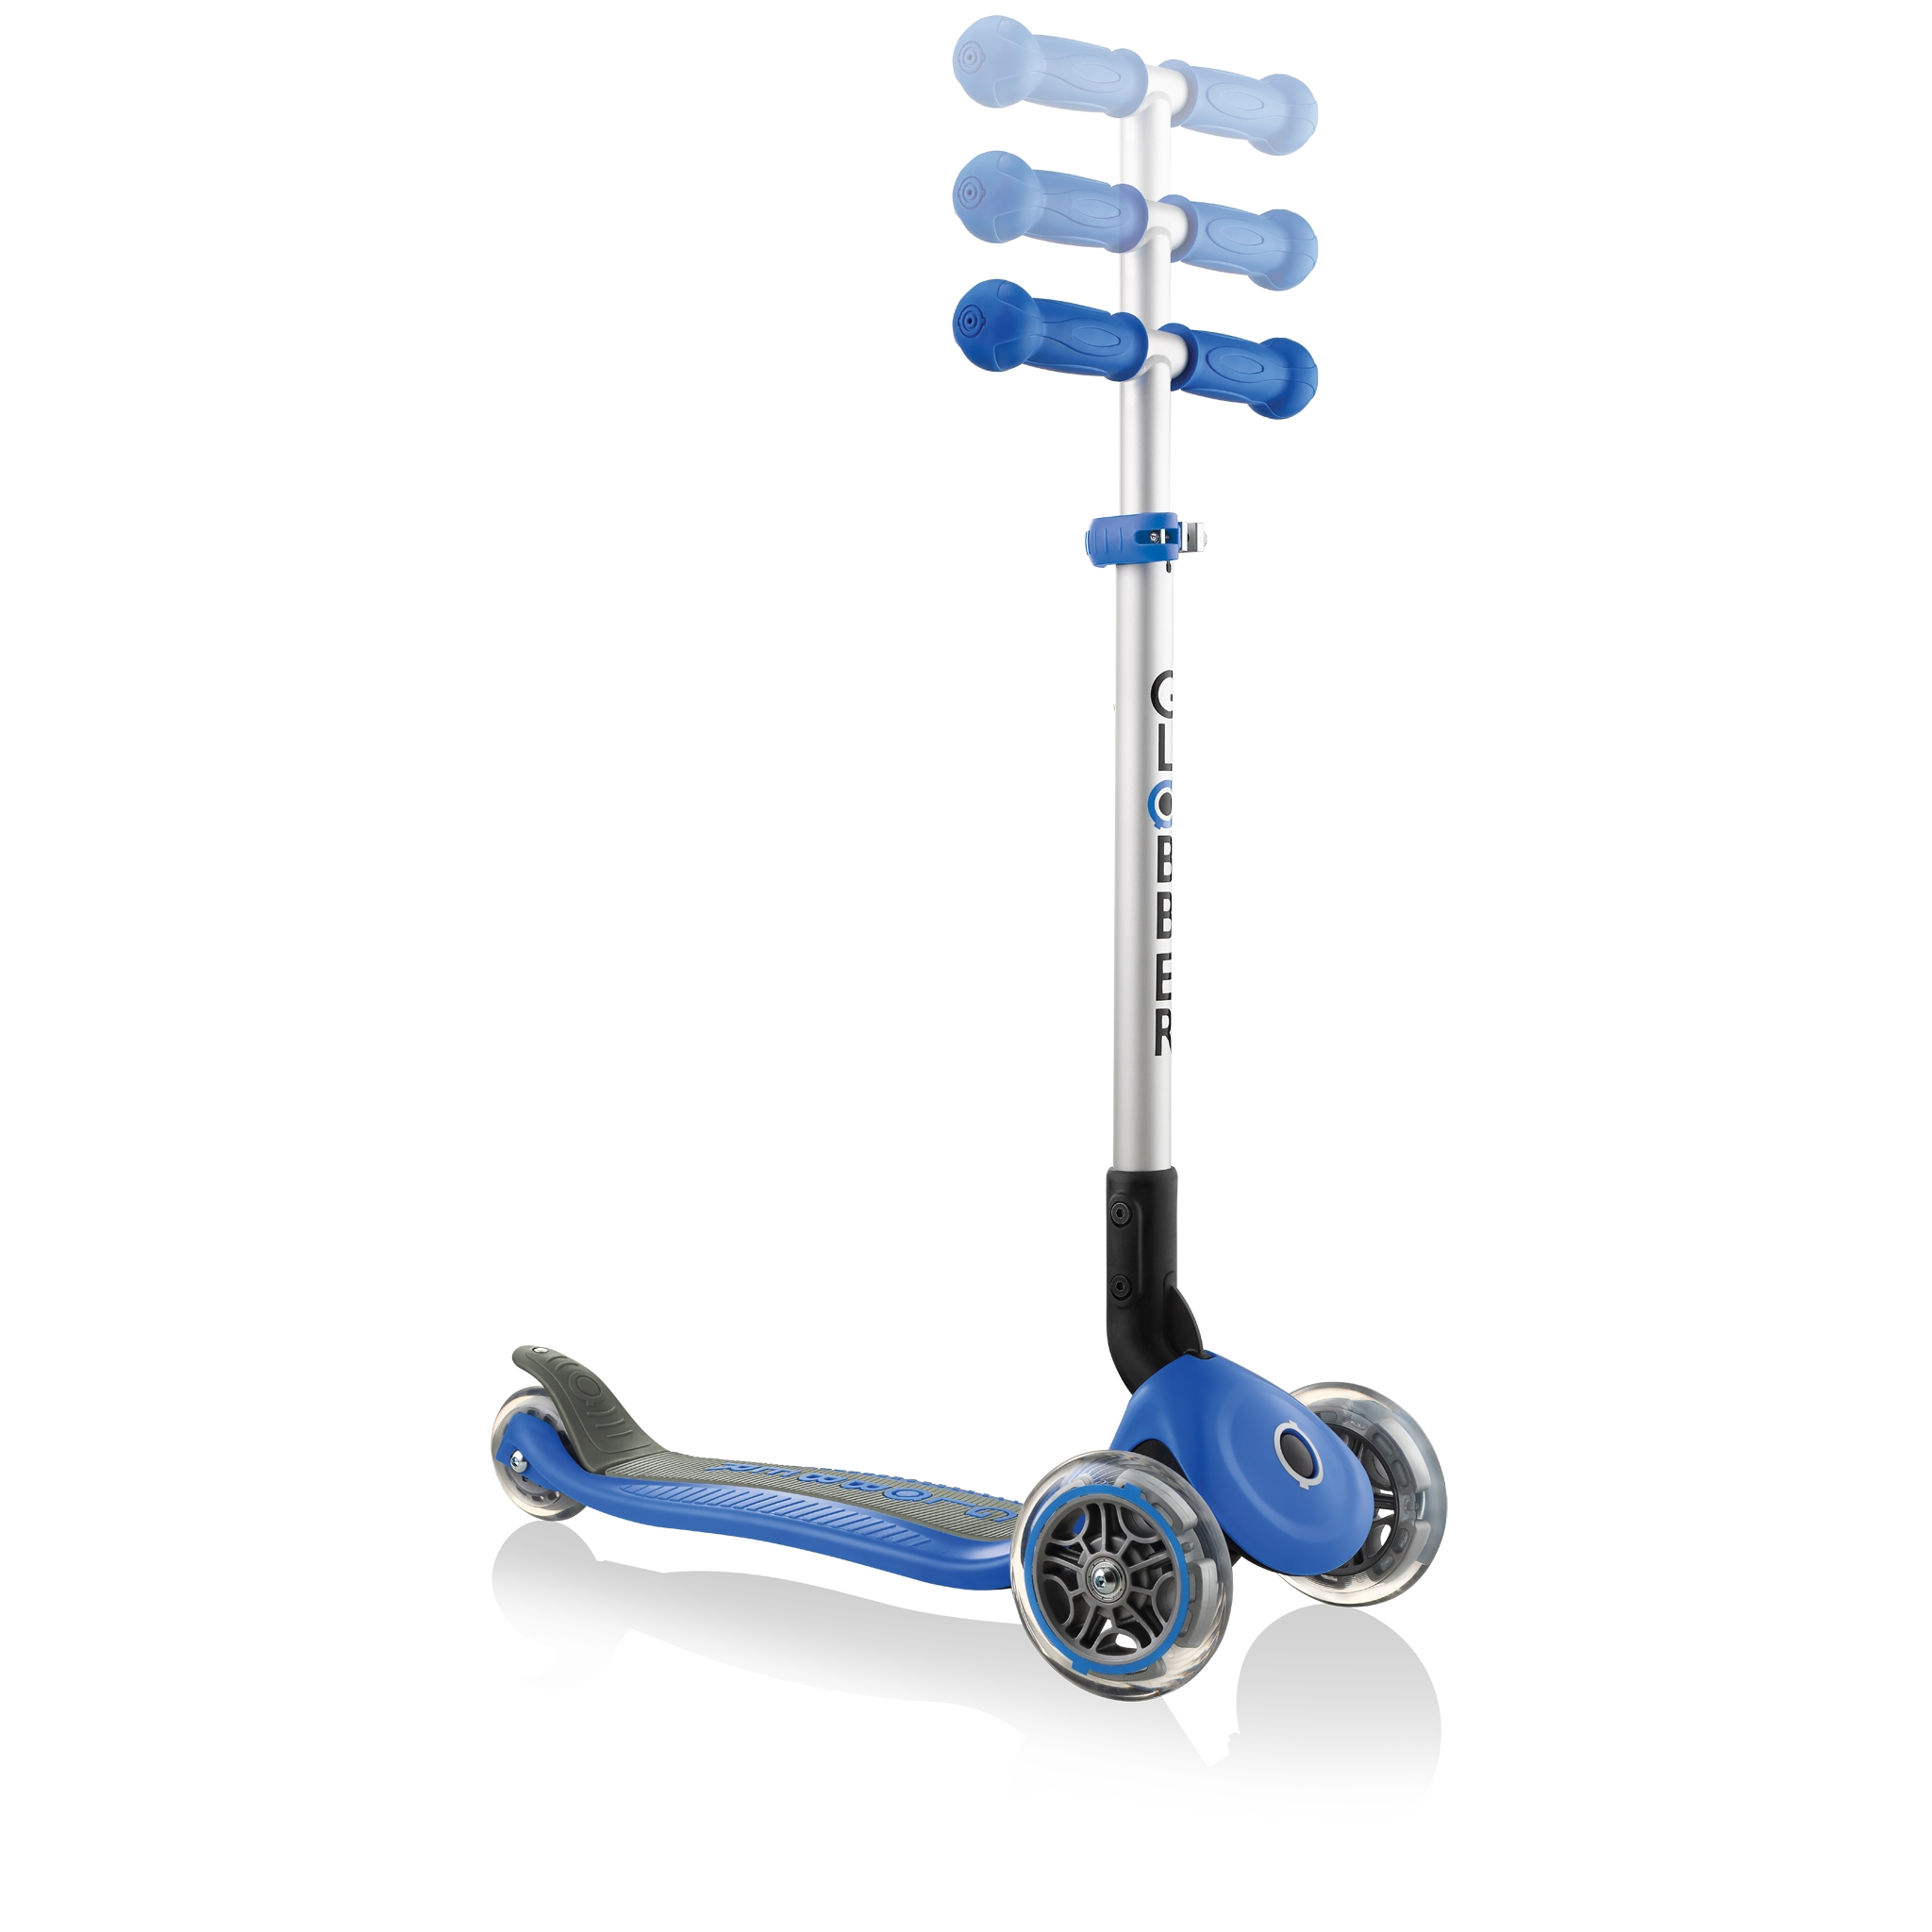 PRIMO-FOLDABLE-adjustable-scooter-for-kids-navy-blue